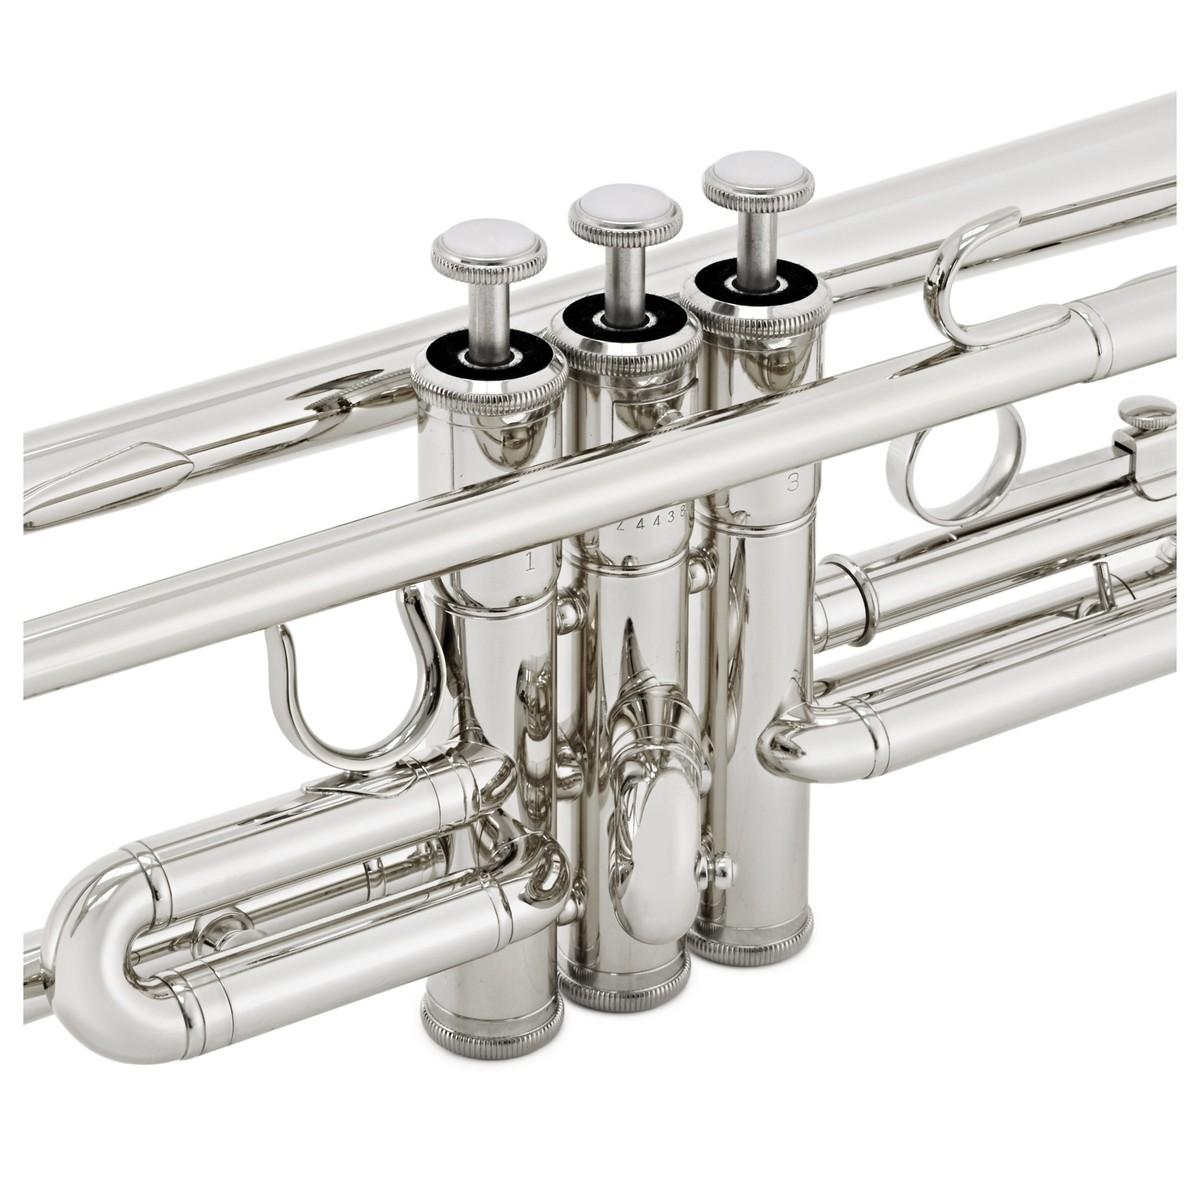 Yamaha ytr3335 student trumpet silver at for Yamaha student trumpets